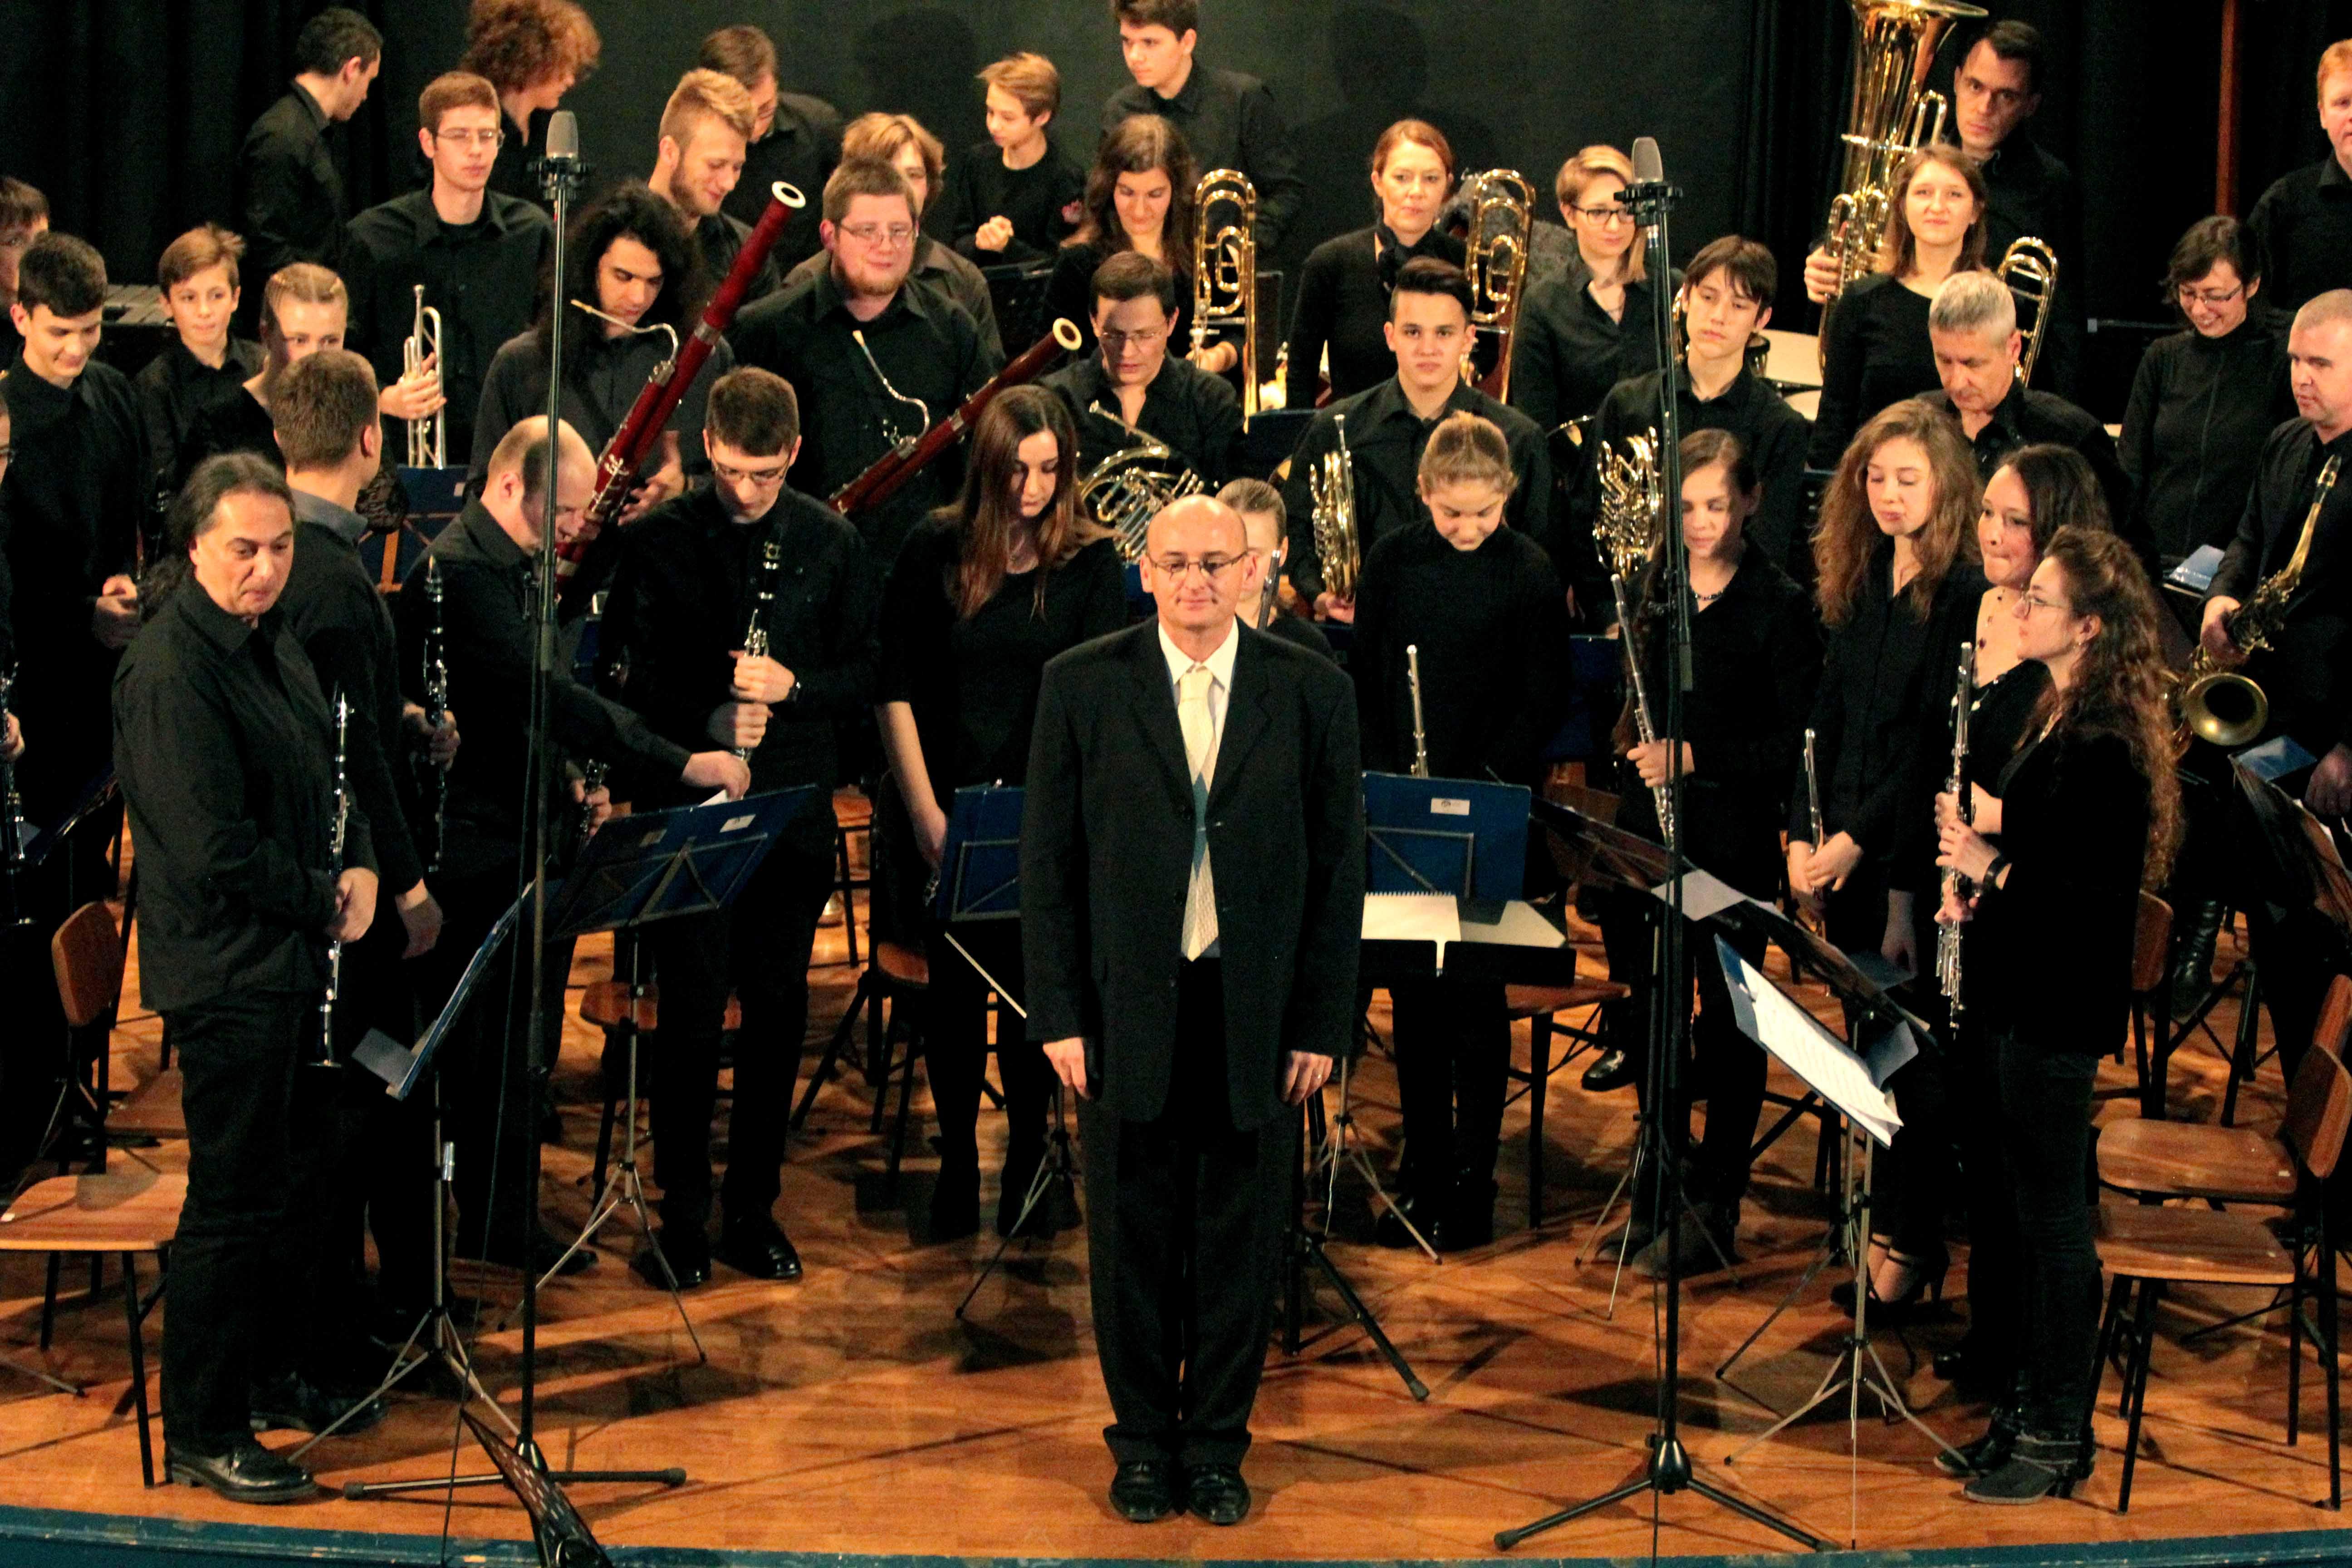 2-godisnji-koncert-puhacki-orkestar-2016-by-milan-mimi-petic